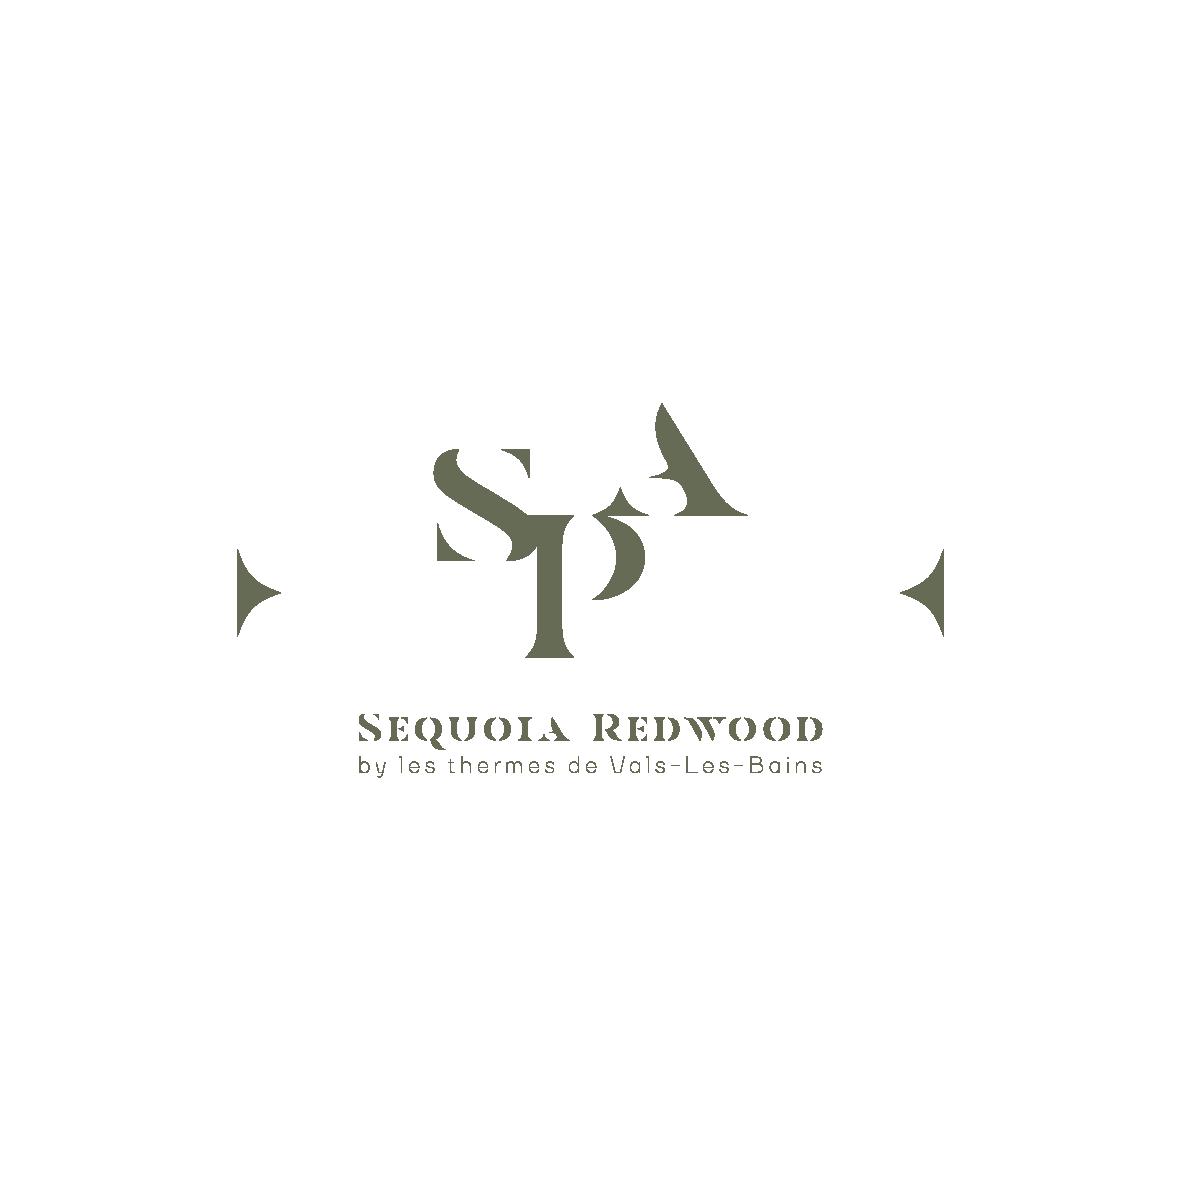 Logotype__LeSpaVLB©guillaumeetlaurie_Plan de travail 1 (1)